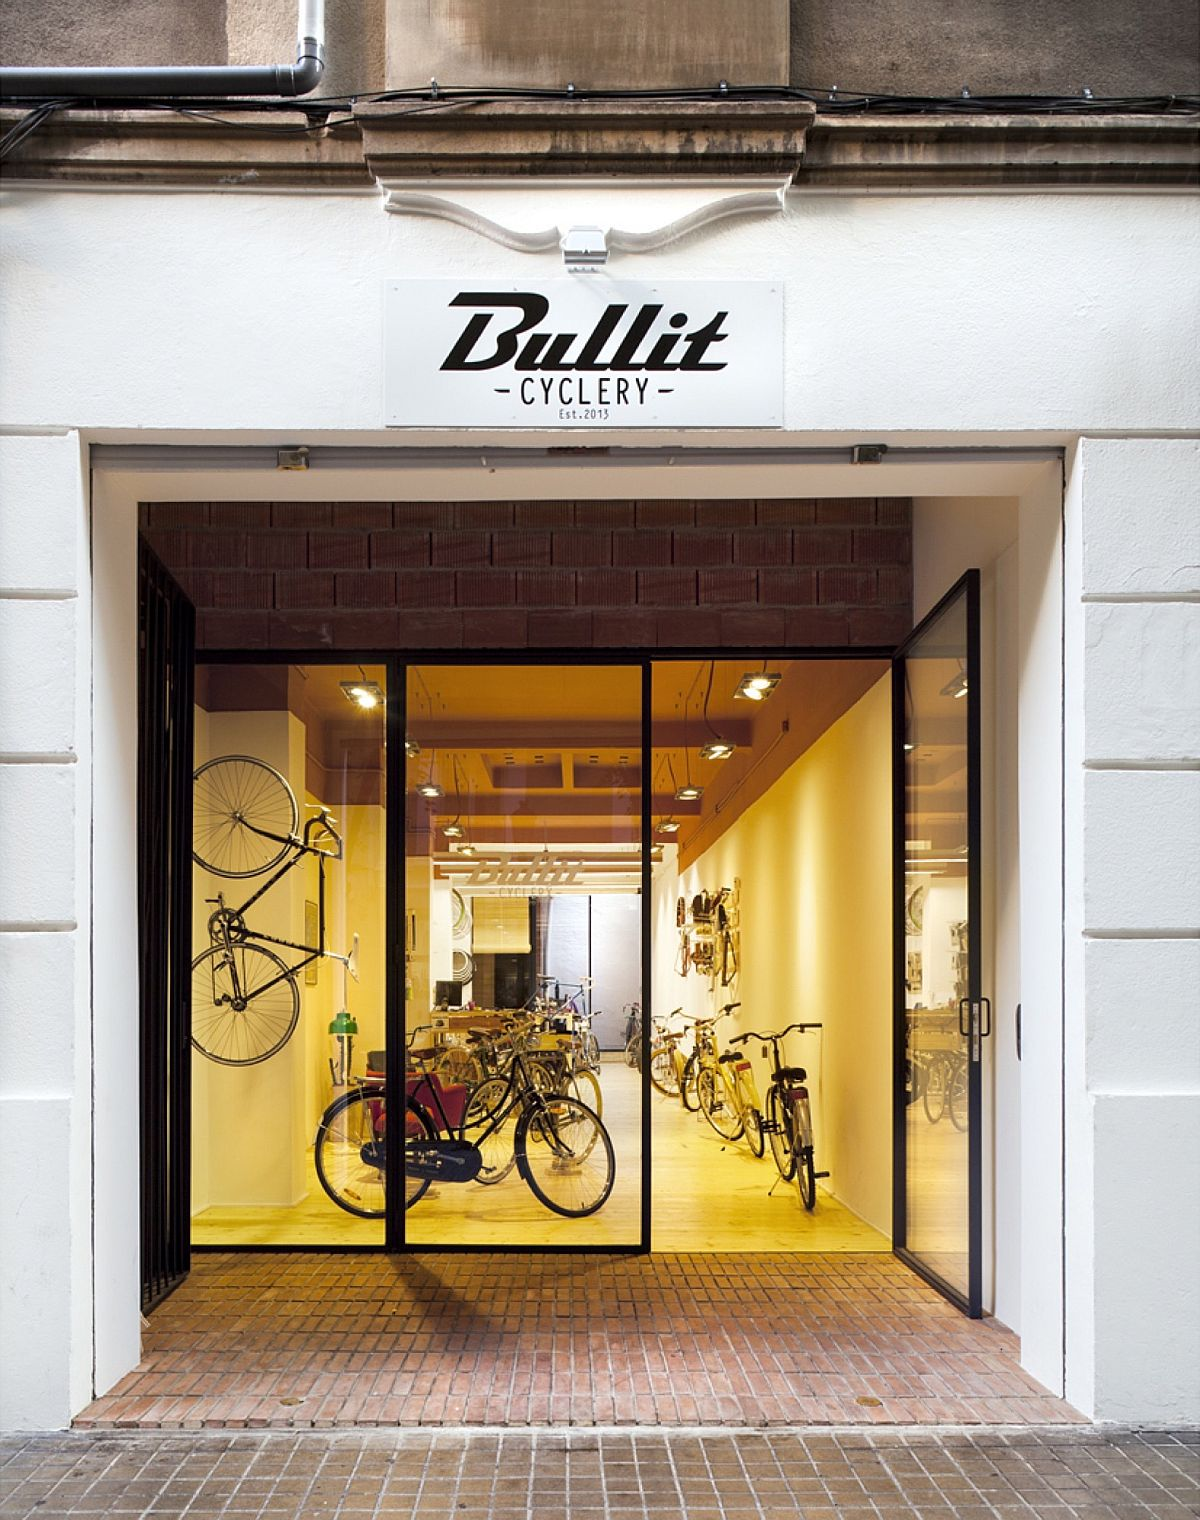 Bullit Cyclery in Valencia Bullit Cyclery: Dark Bike Shop in Valencia Gets a Breezy, Cozy Revamp